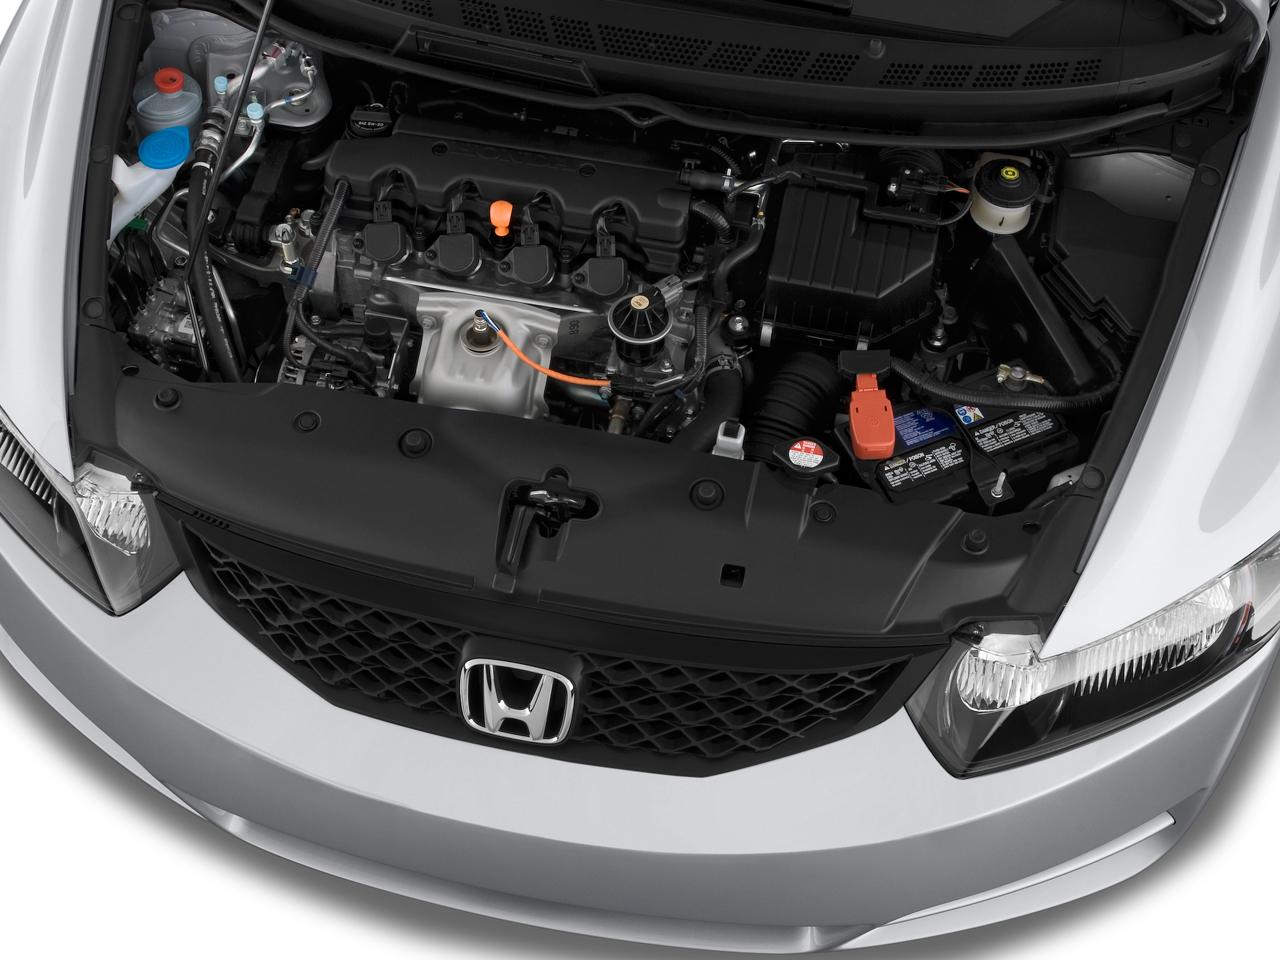 2009 Honda Civic Si Coupe - Honda Sport Coupe Review ...